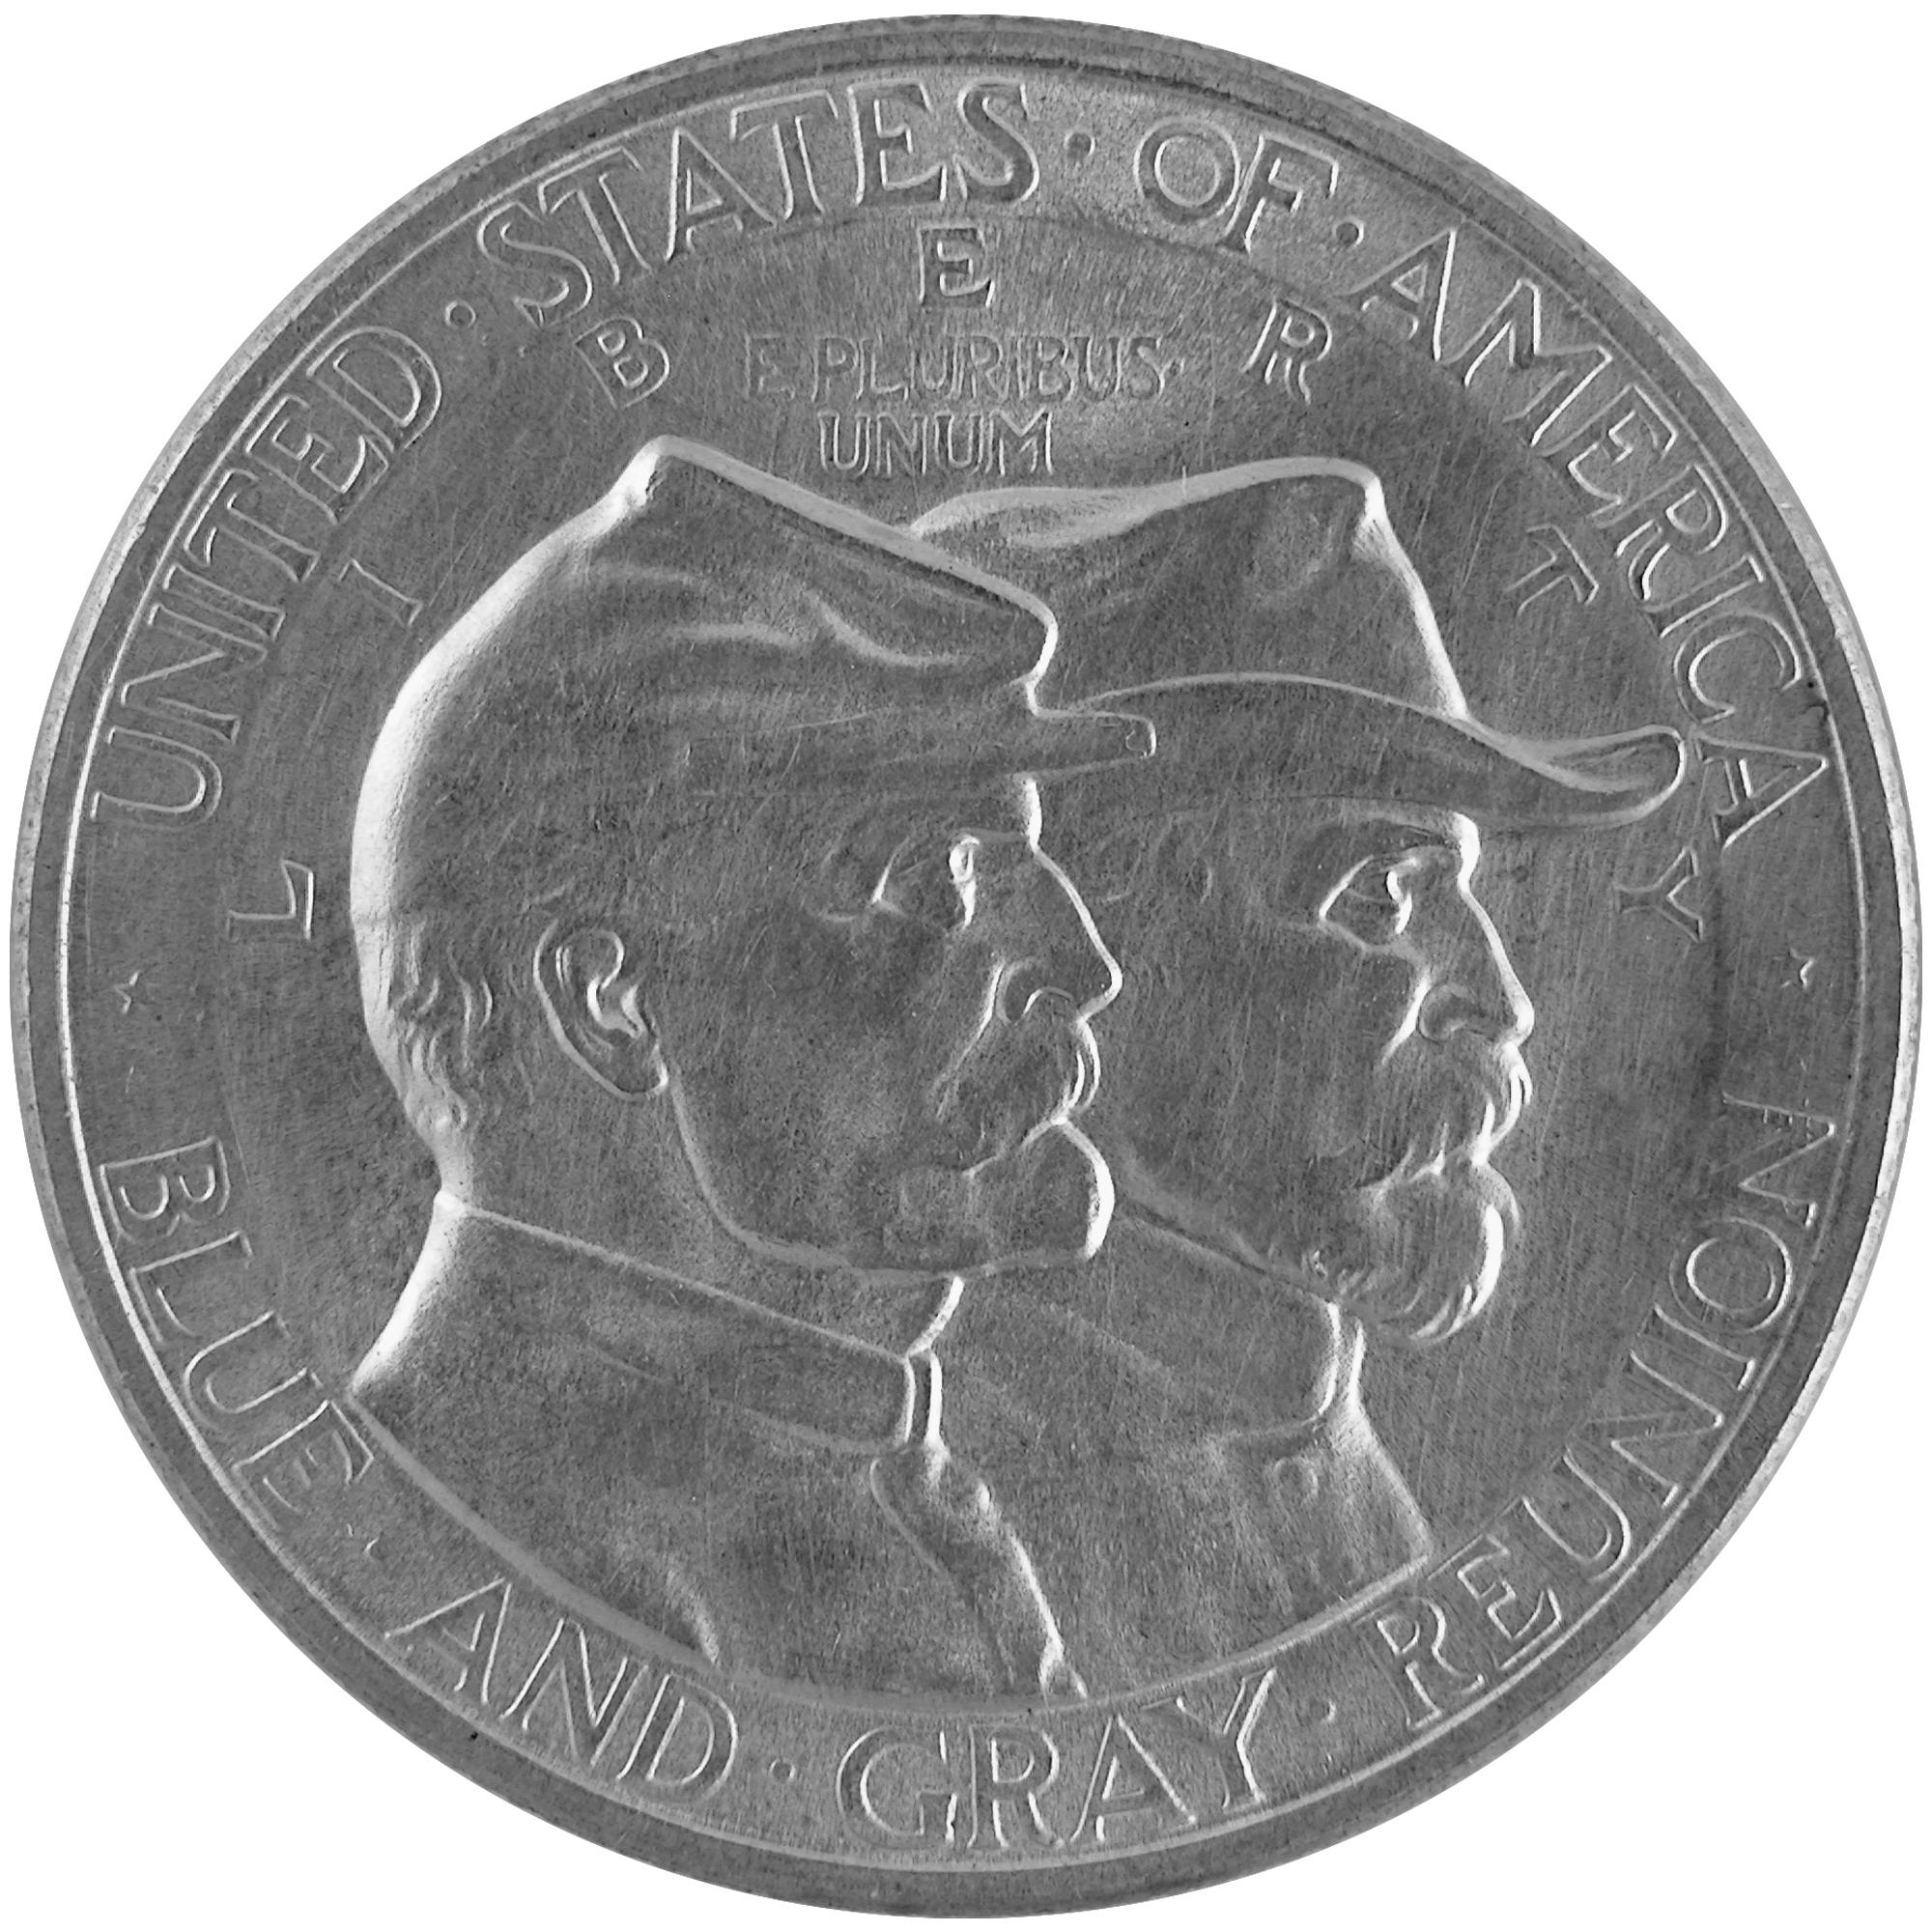 1936 Battle Of Gettysburg Commemorative Silver Half Dollar Coin Obverse